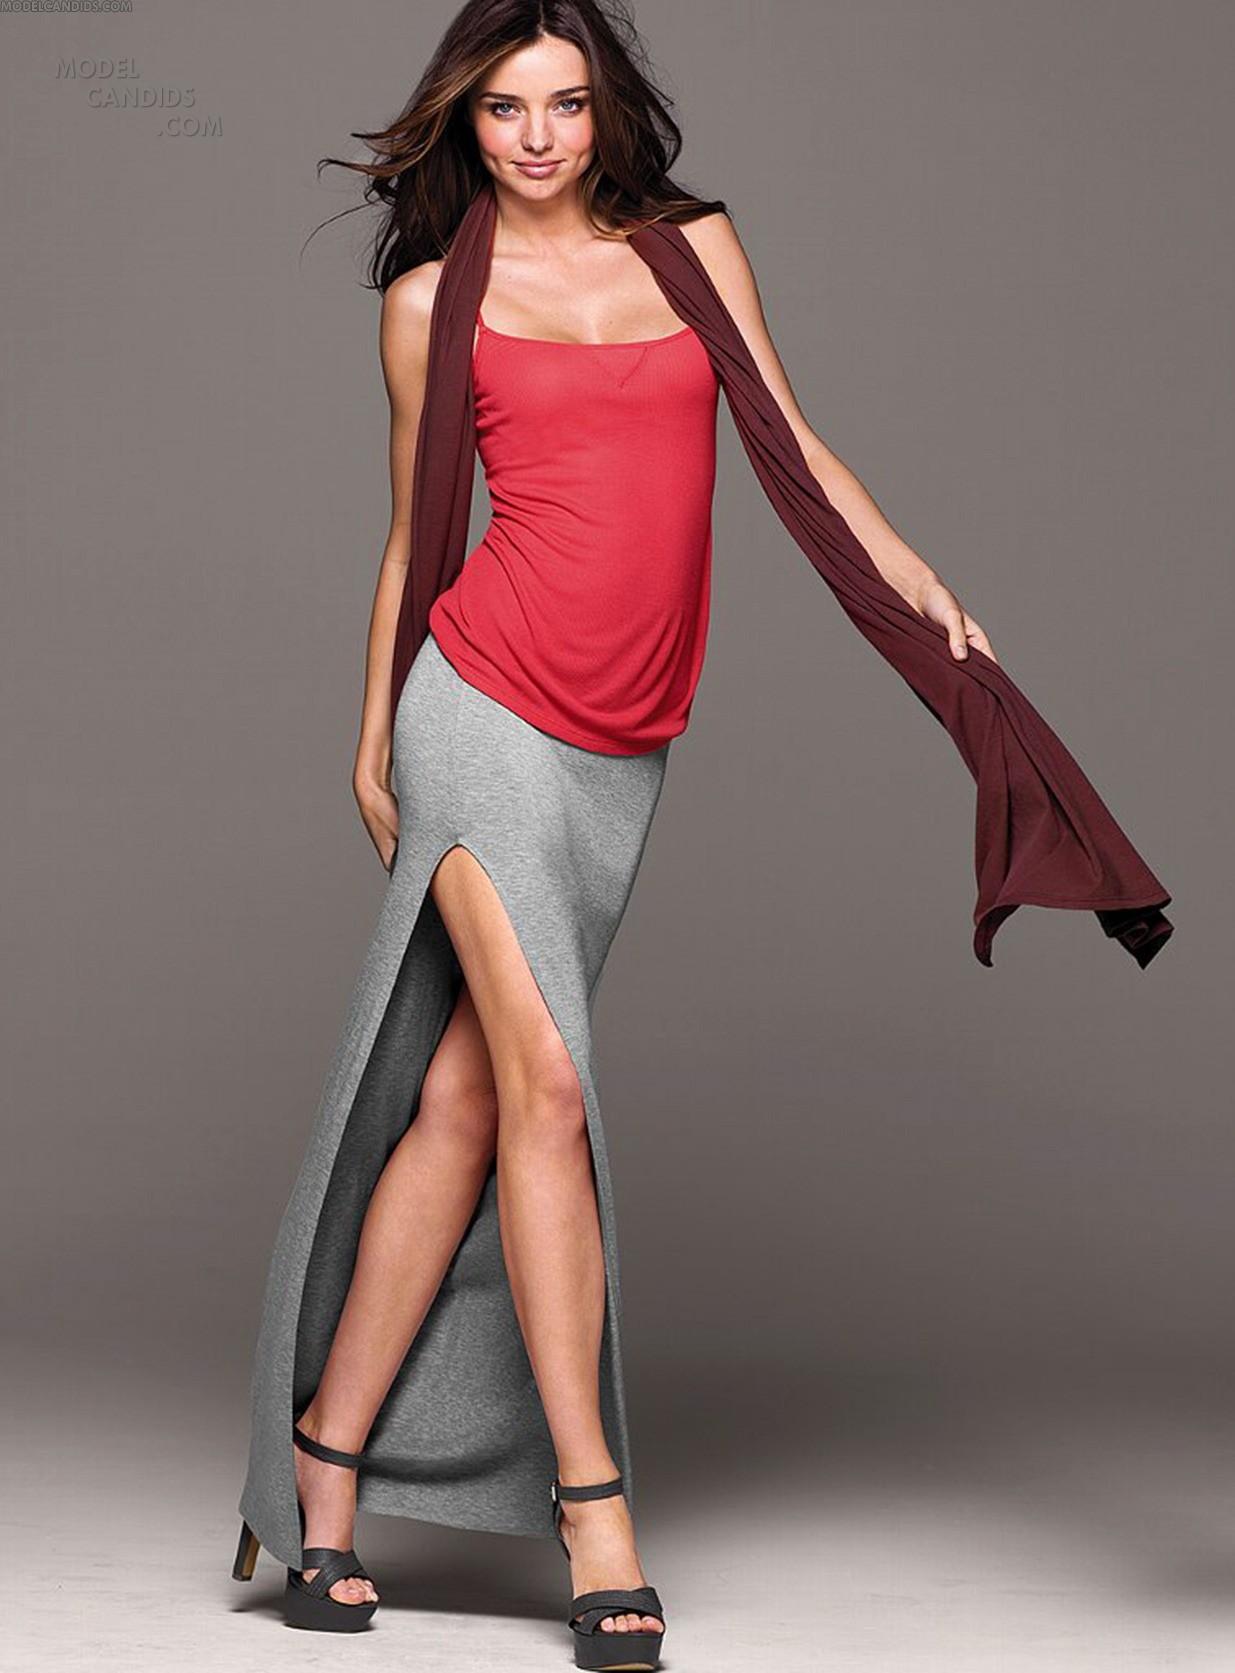 Фото девушки в мини юбке с разрезом 7 фотография